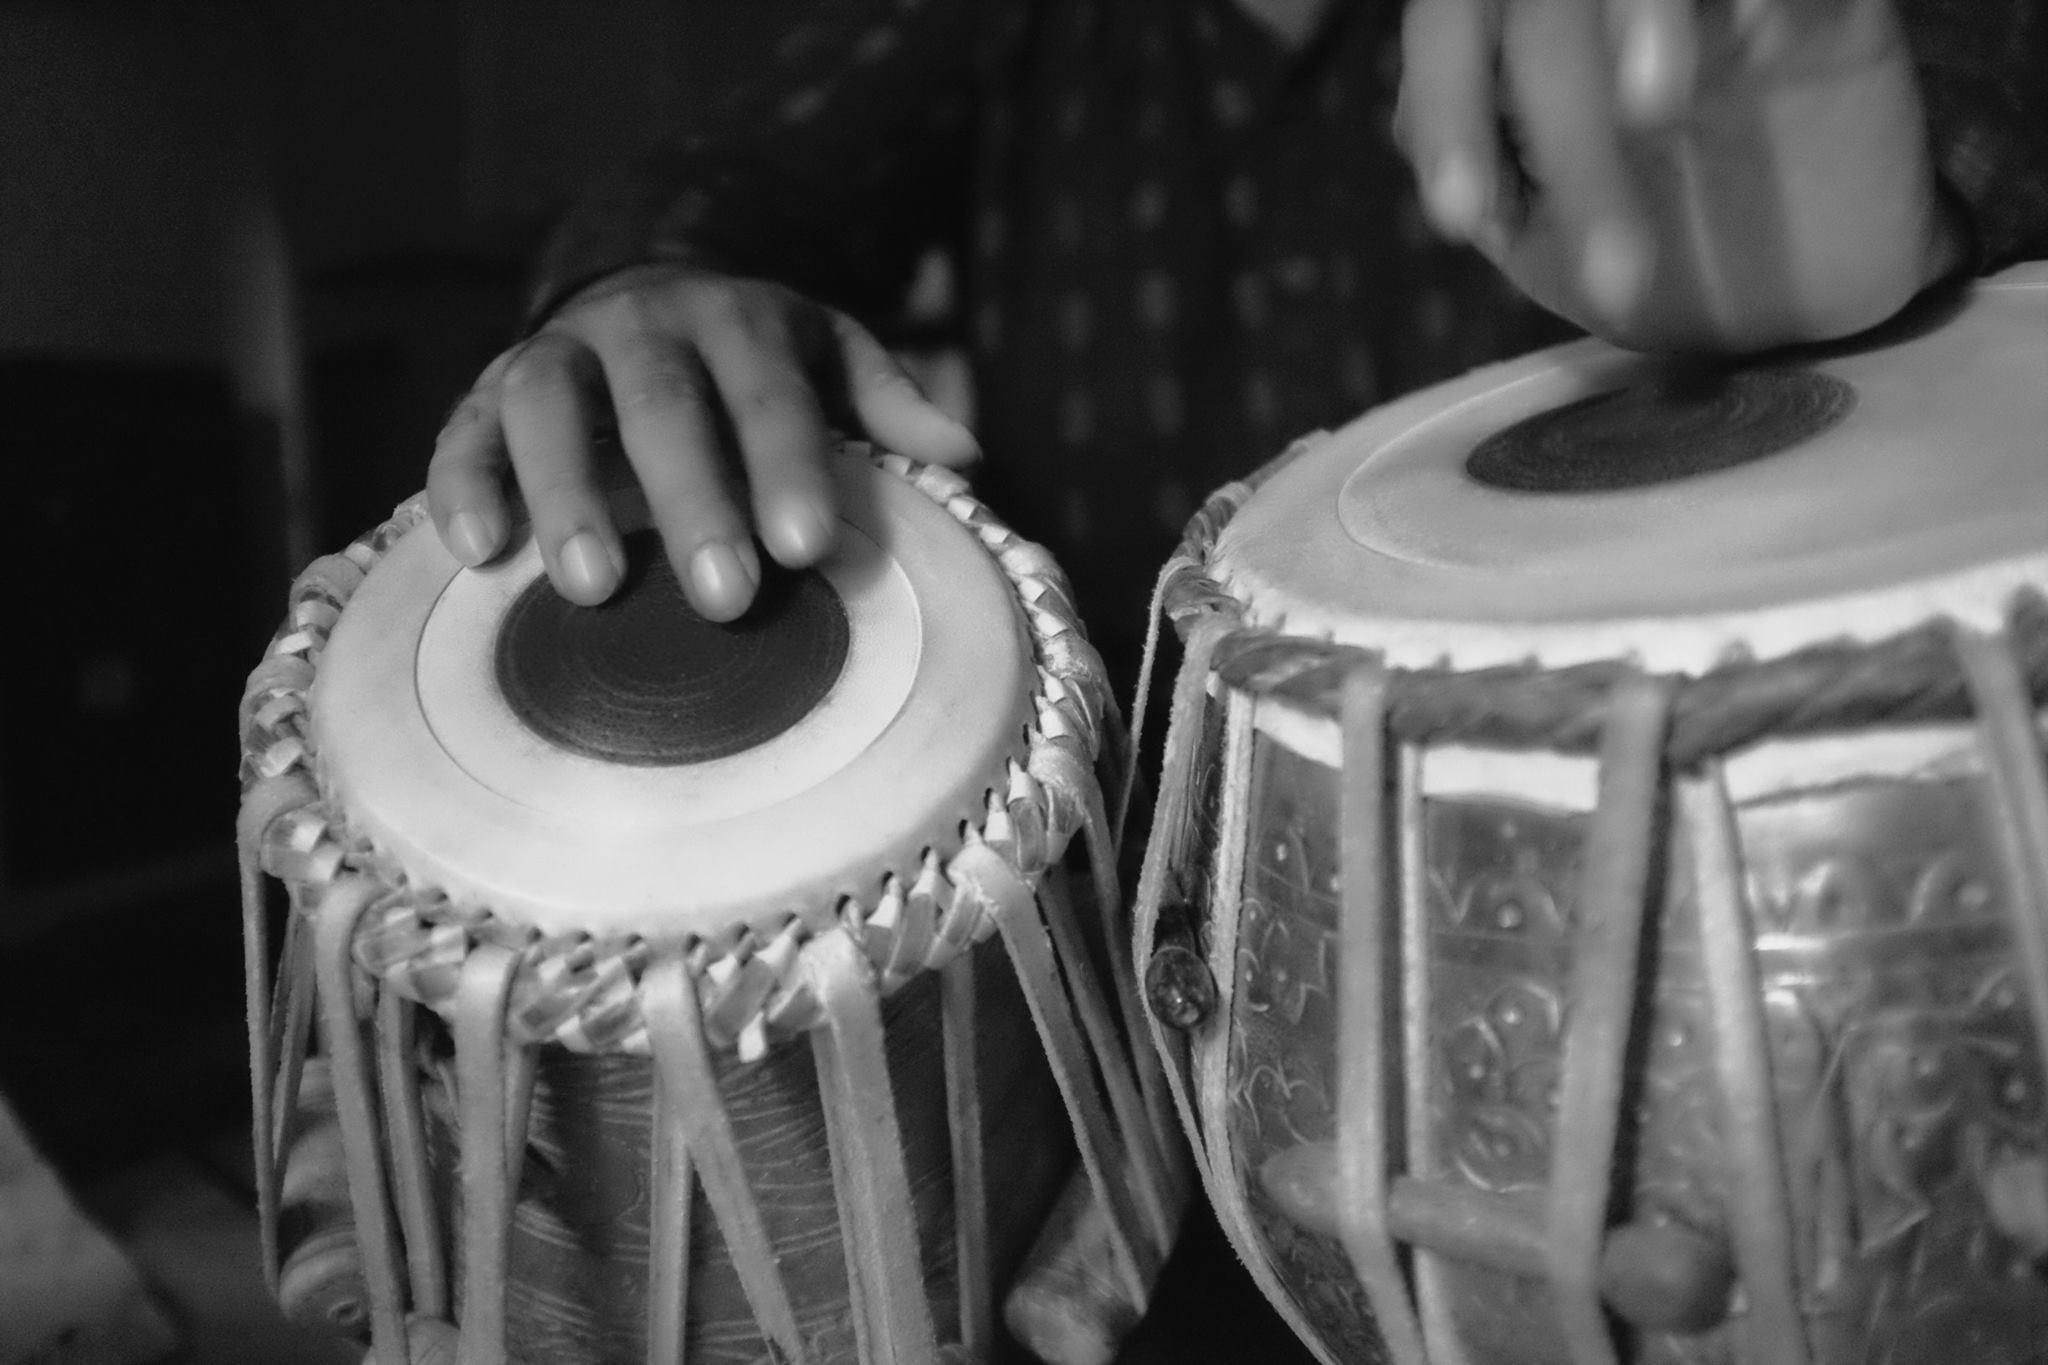 Image courtesy of Tabla Maestro Muthu Kumar